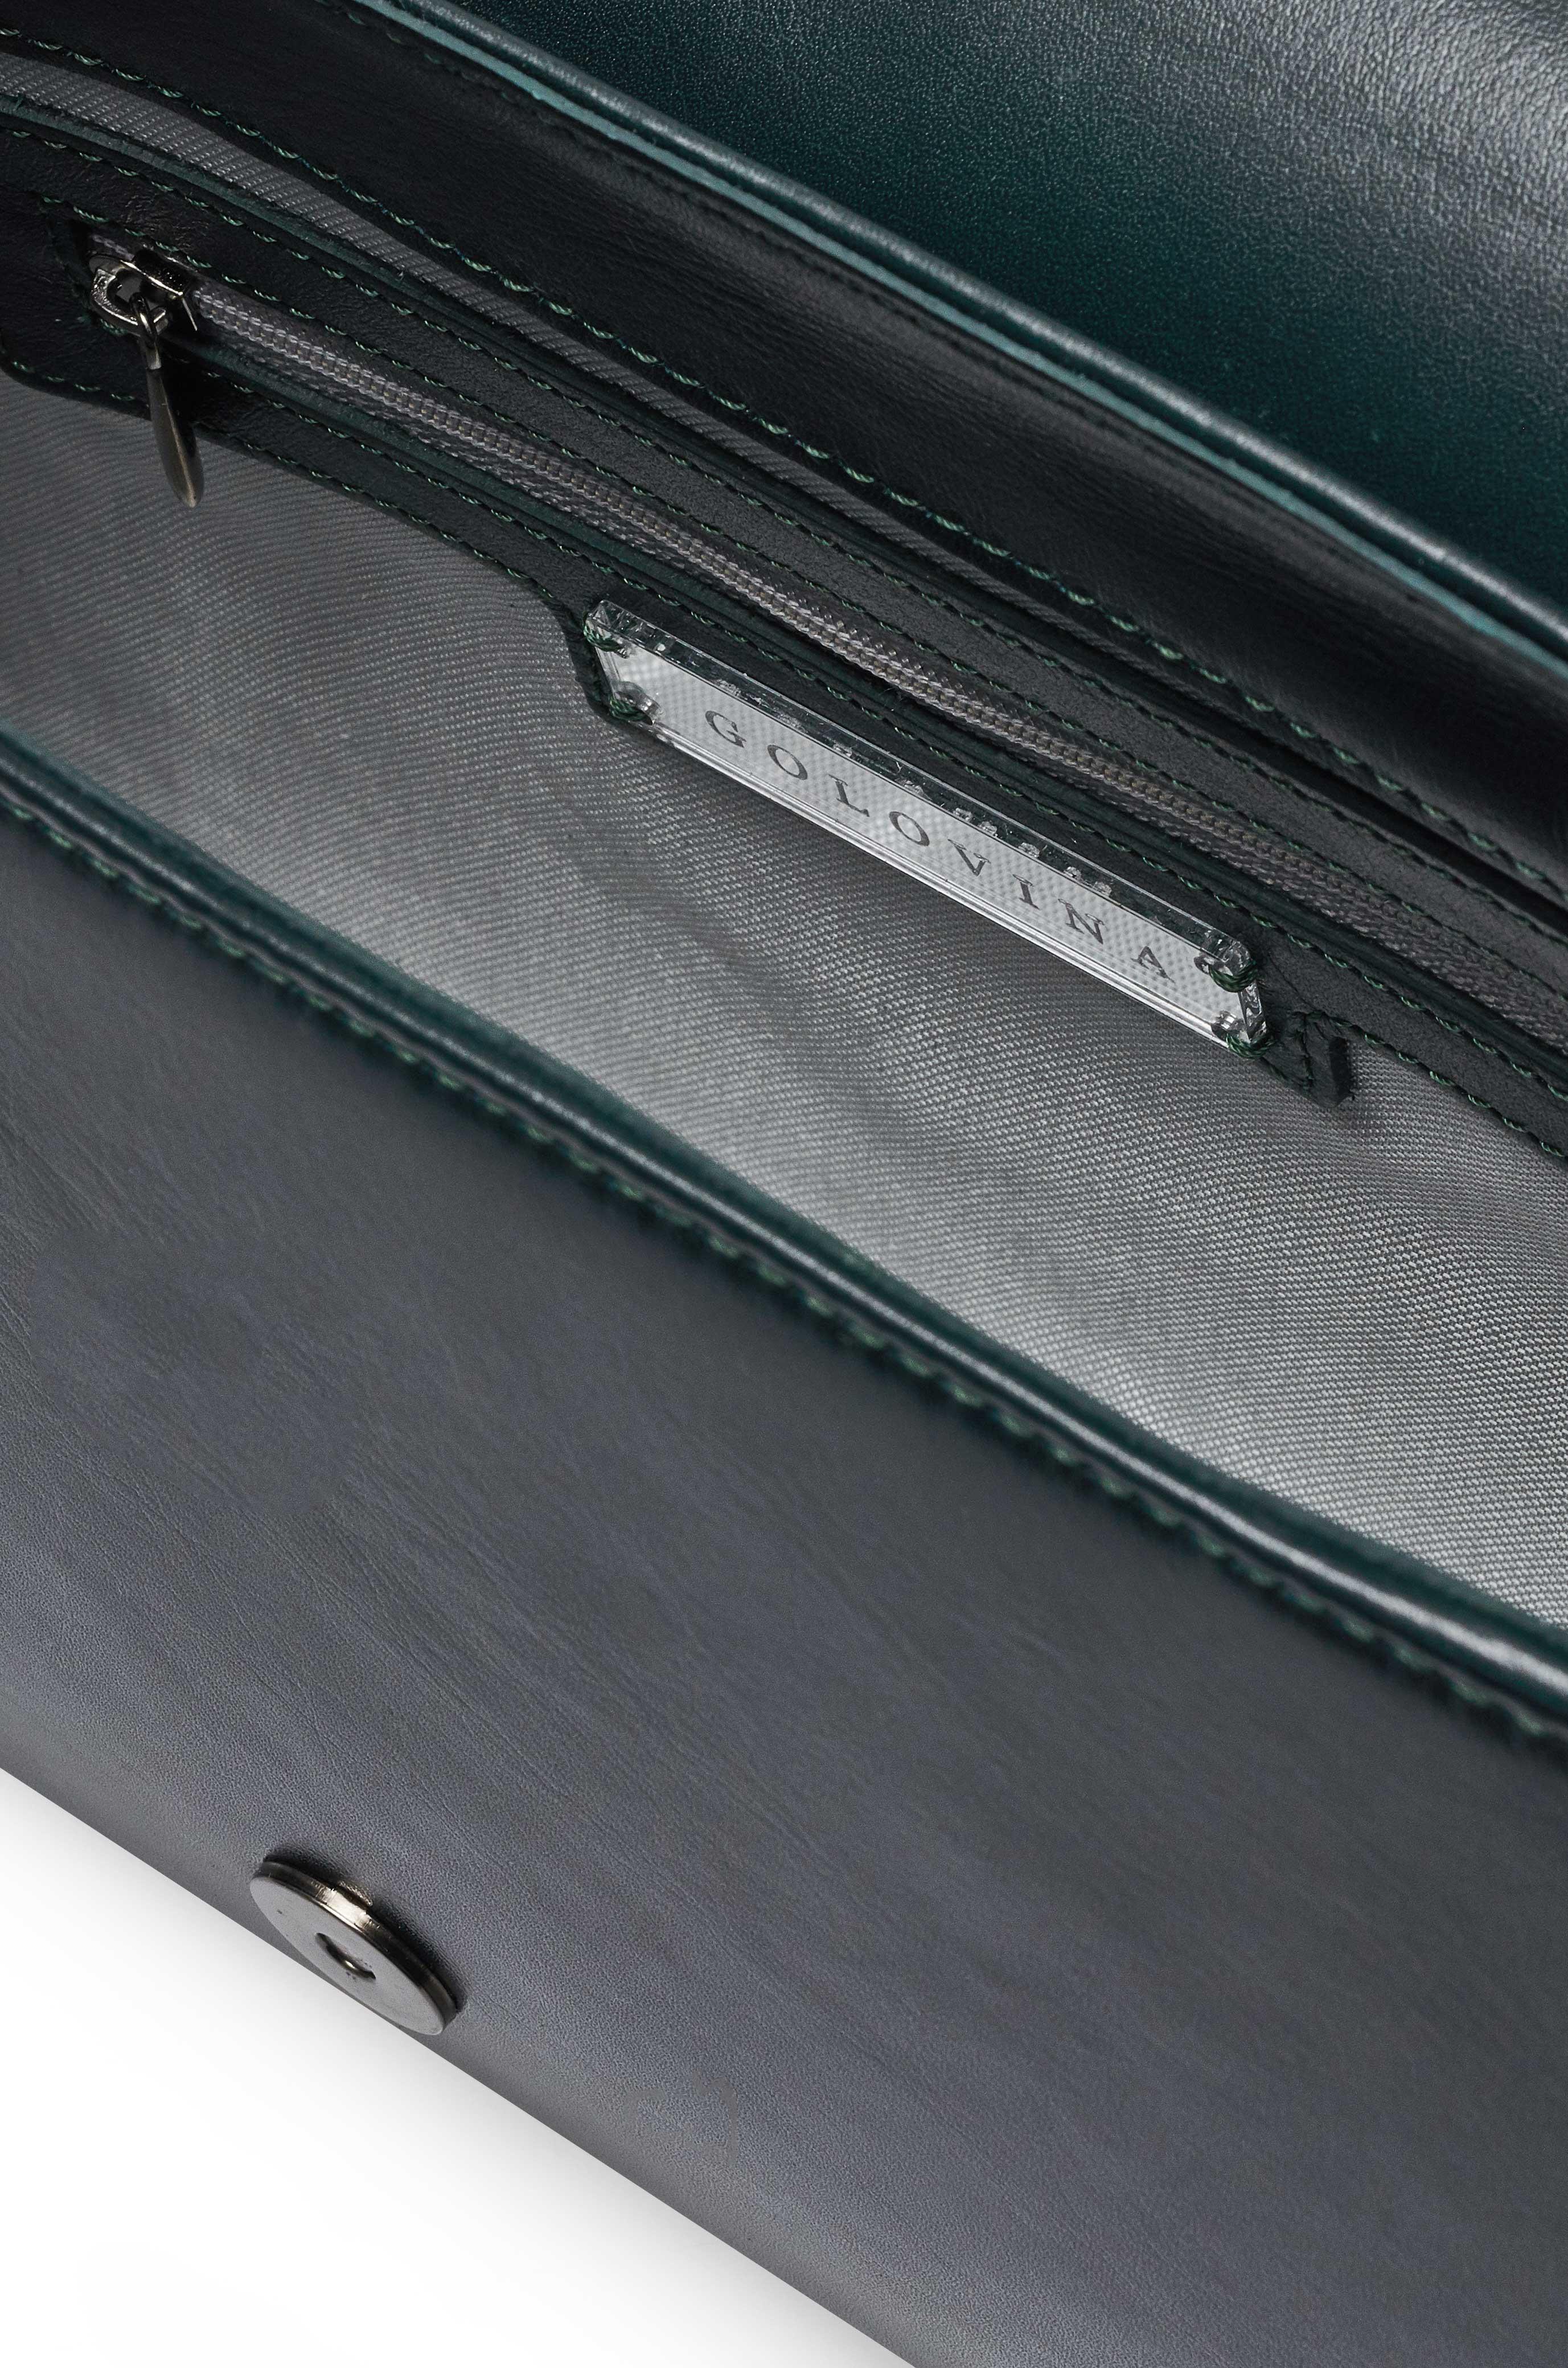 Golovina-Angel Wings & Heart bag emerald green and grey